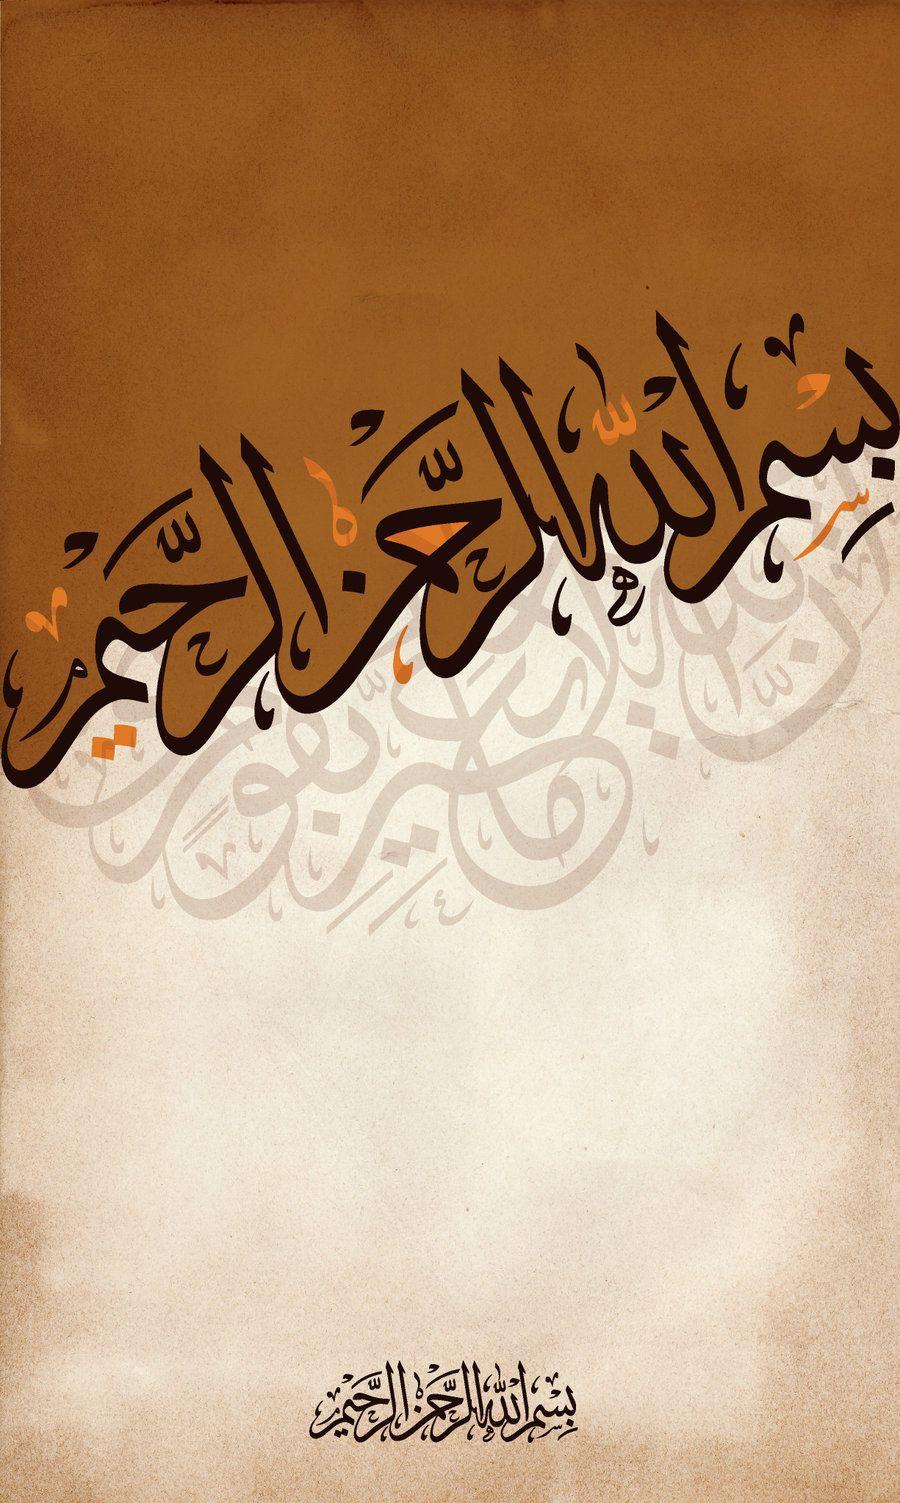 بسم الله الرحمن الرحيم In The Name Of Allah The Most Gracious The Most Merciful Source X Islamic Calligraphy Islamic Calligraphy Painting Caligraphy Art